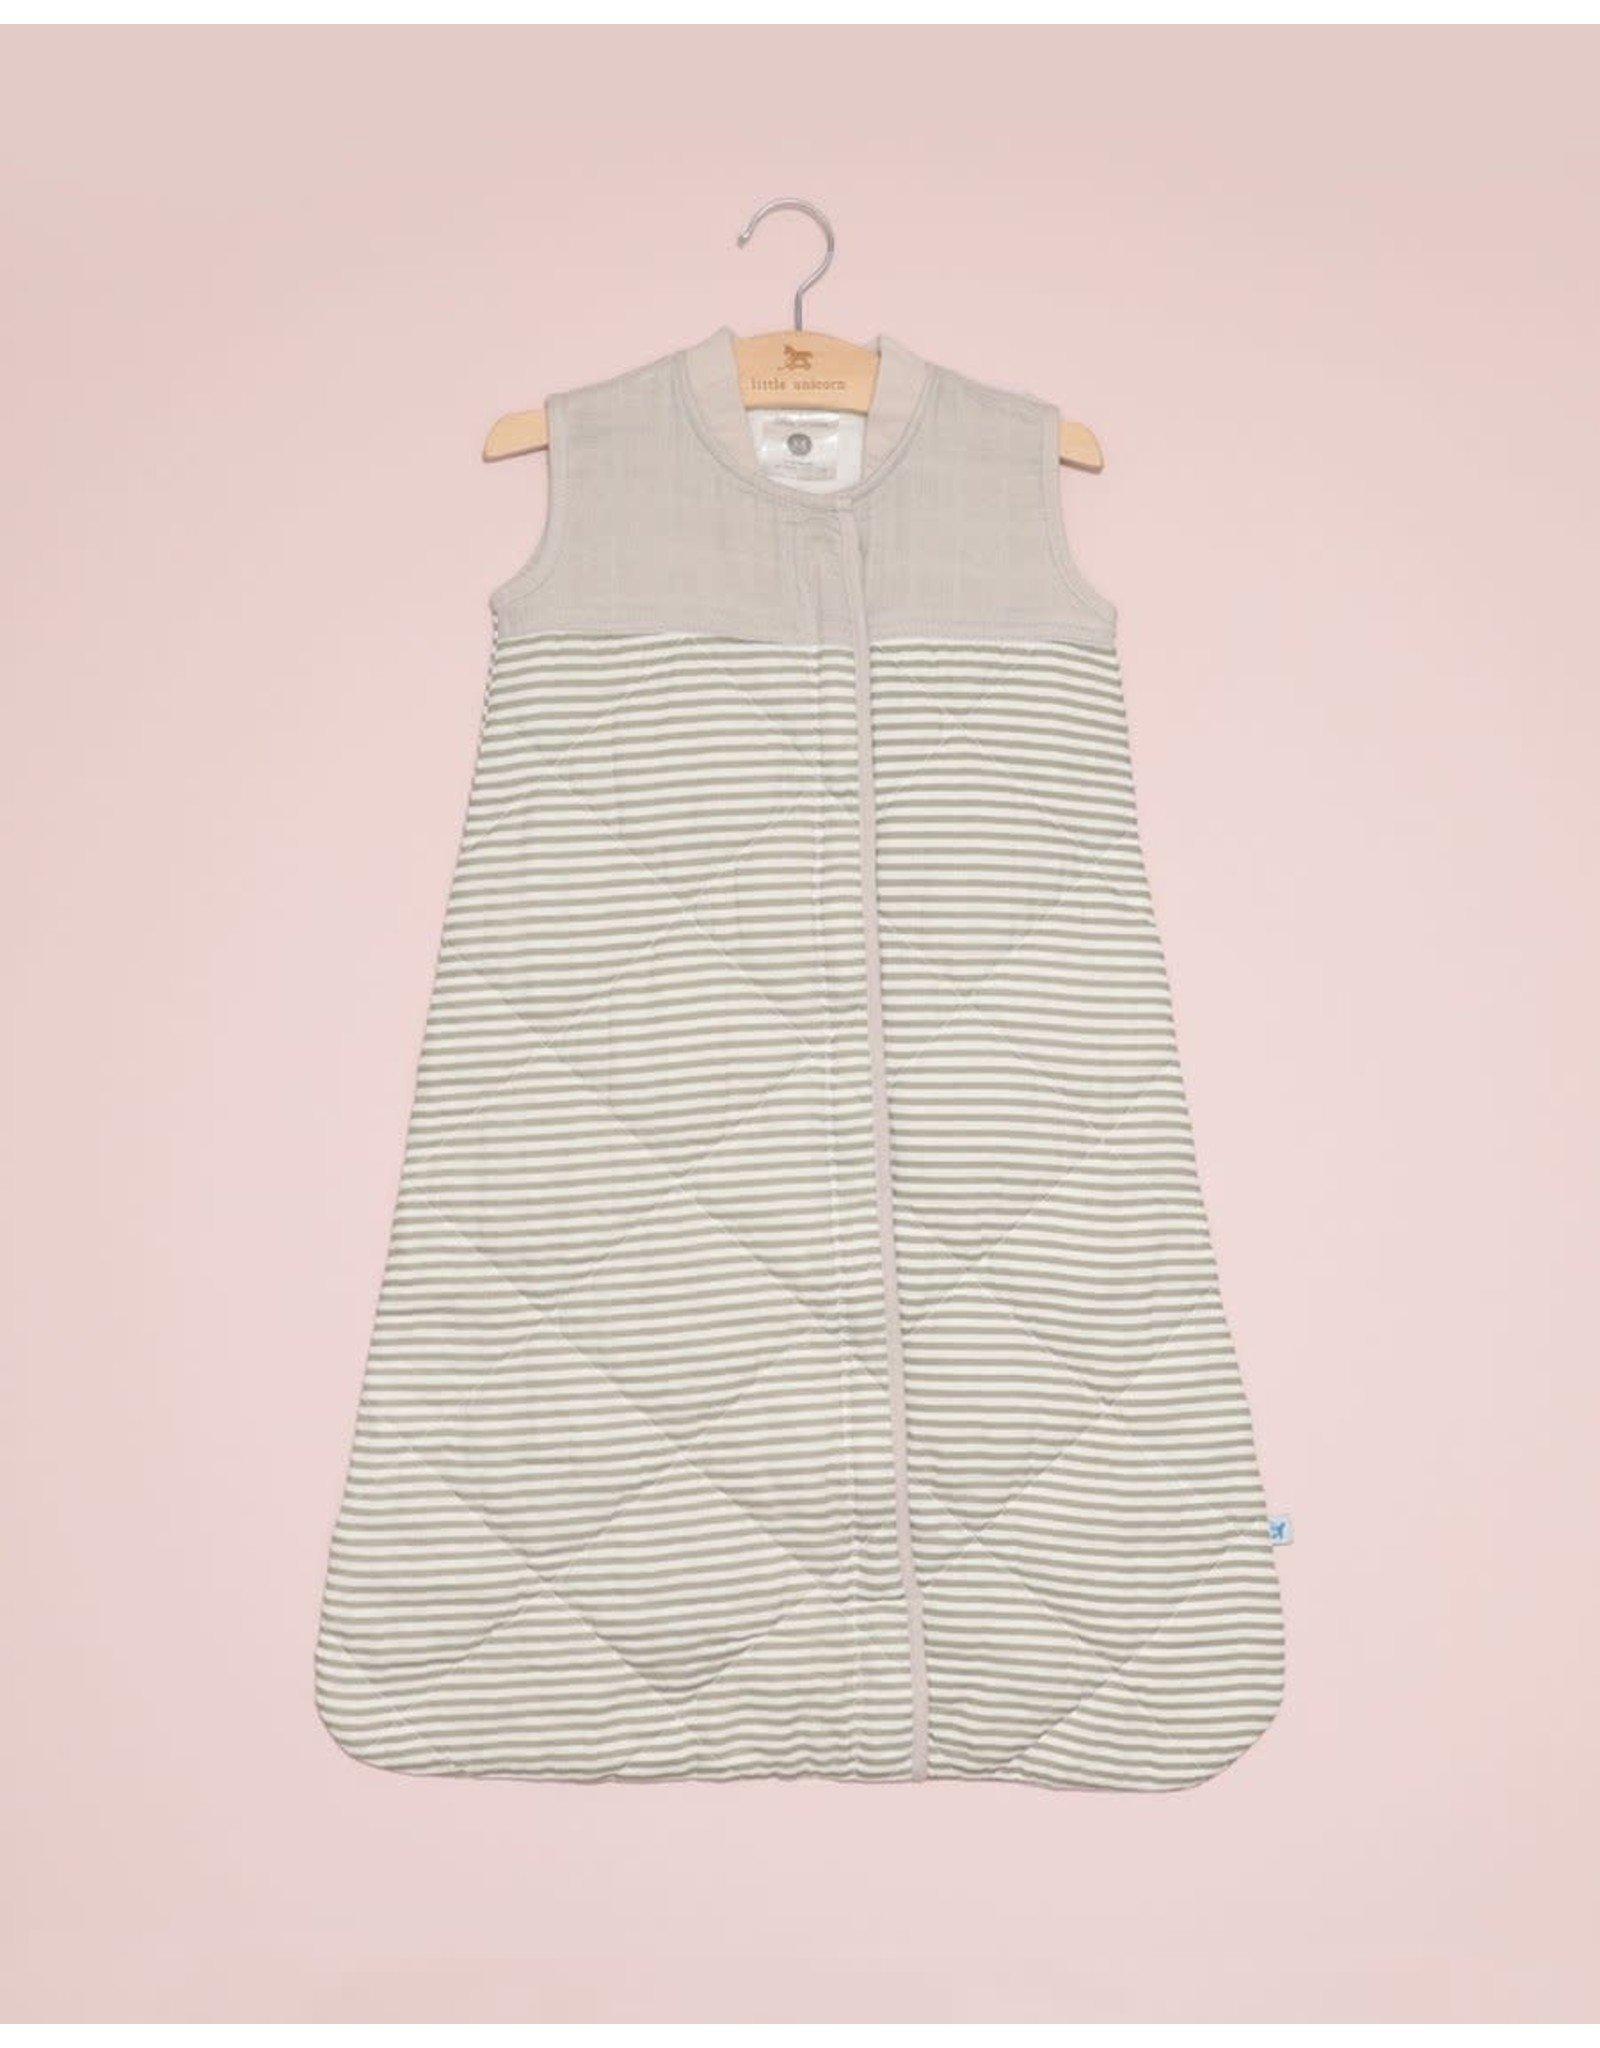 Little Unicorn, LLC Cotton Muslin Quilted Sleep Bag, Large, Grey Stripe